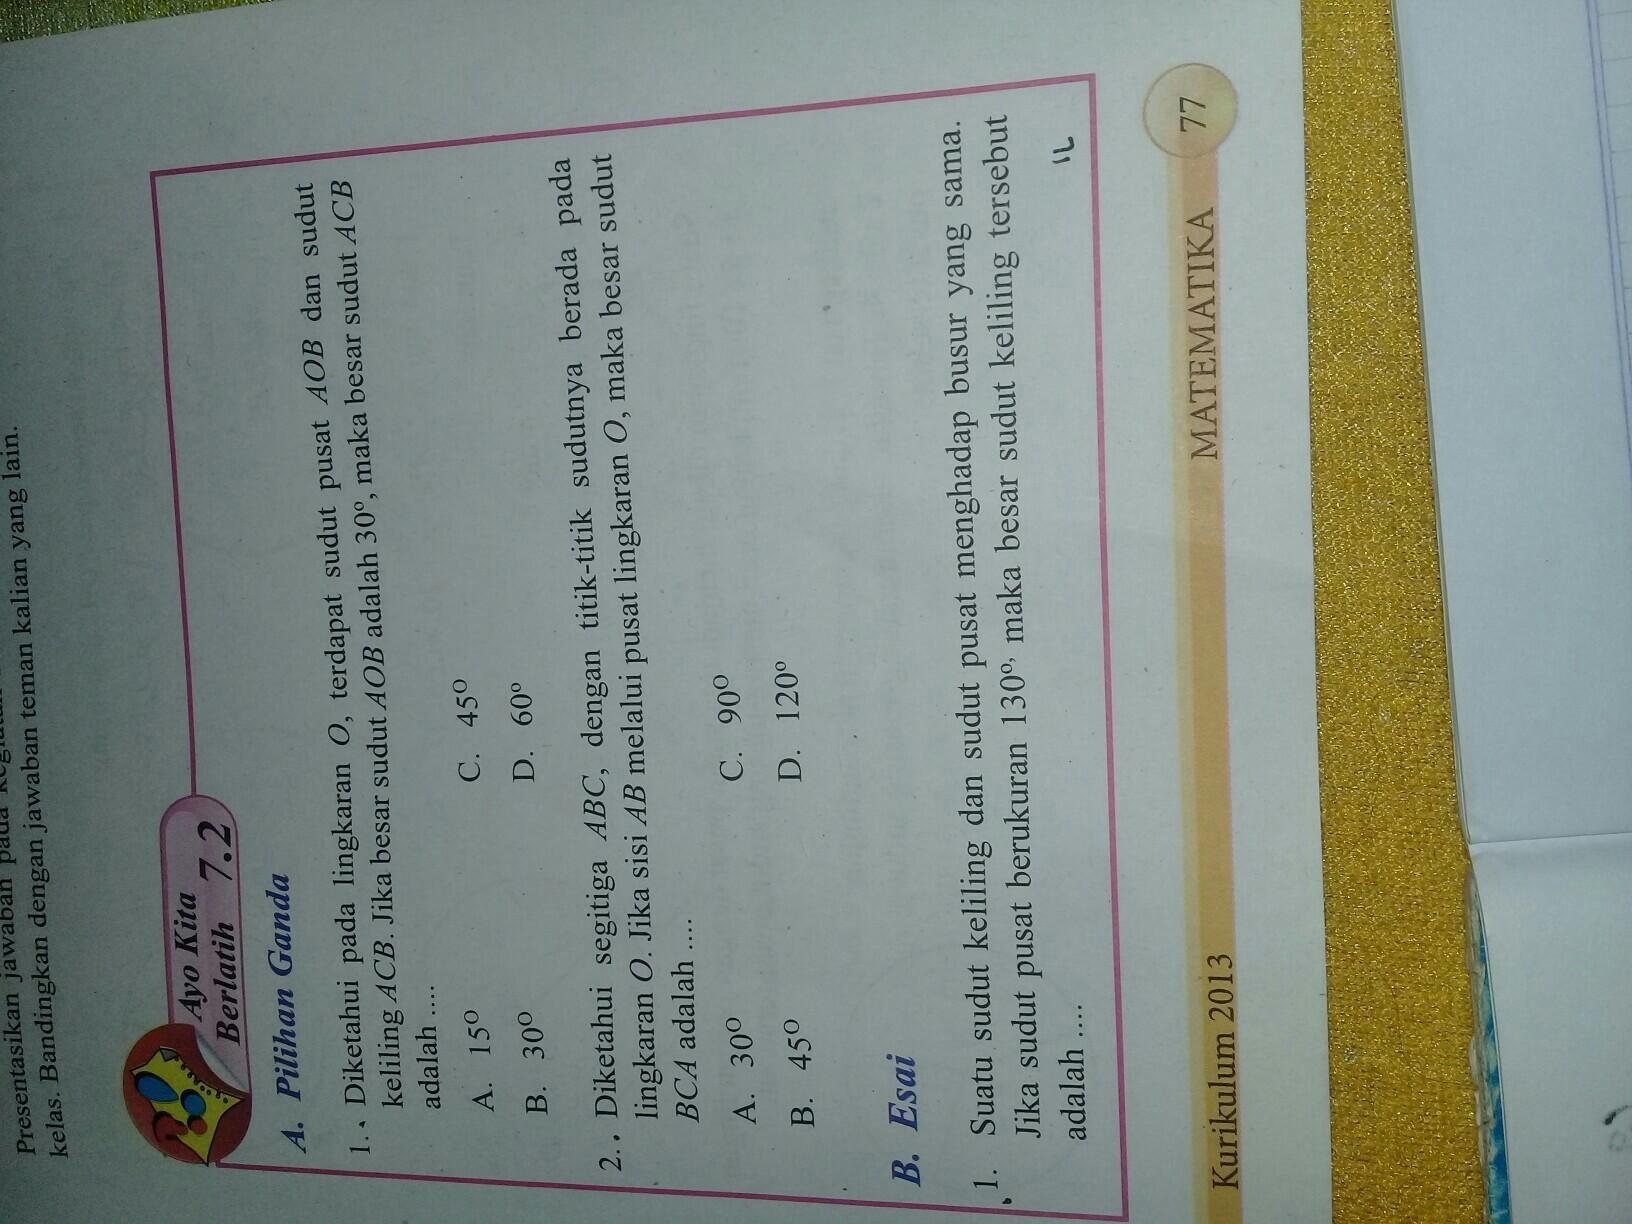 Jawaban Matematika Halaman 77 Kls 8 Semester 2 Brainly Co Id